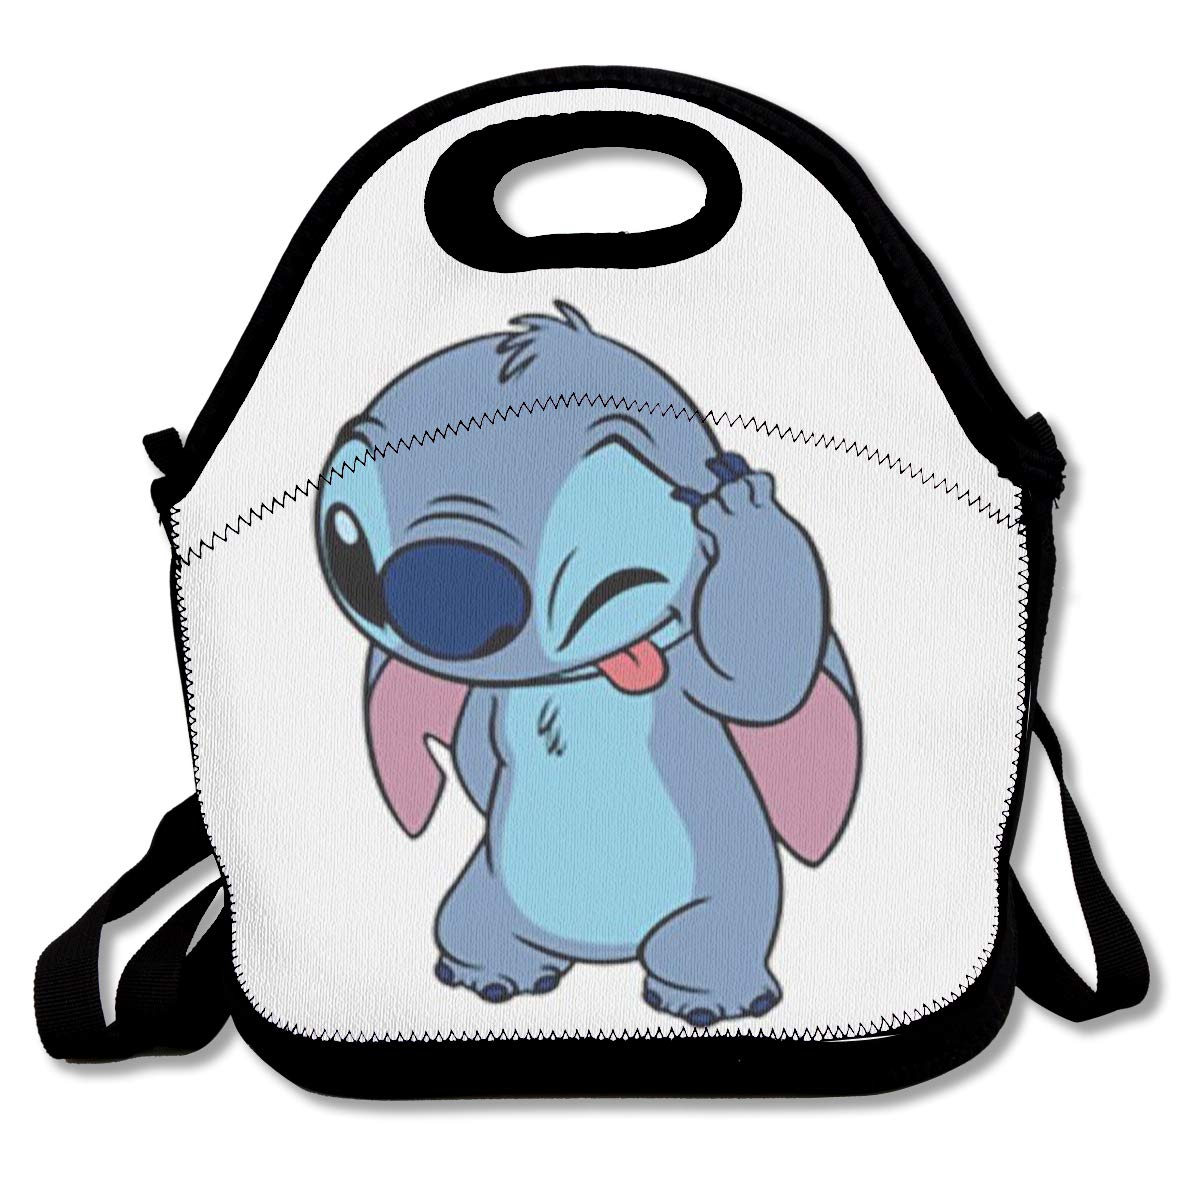 a419efc6cb66 Amazon.com - LIUYAN Custom Lunchbox Stitch Bite You Waterproof Bag ...